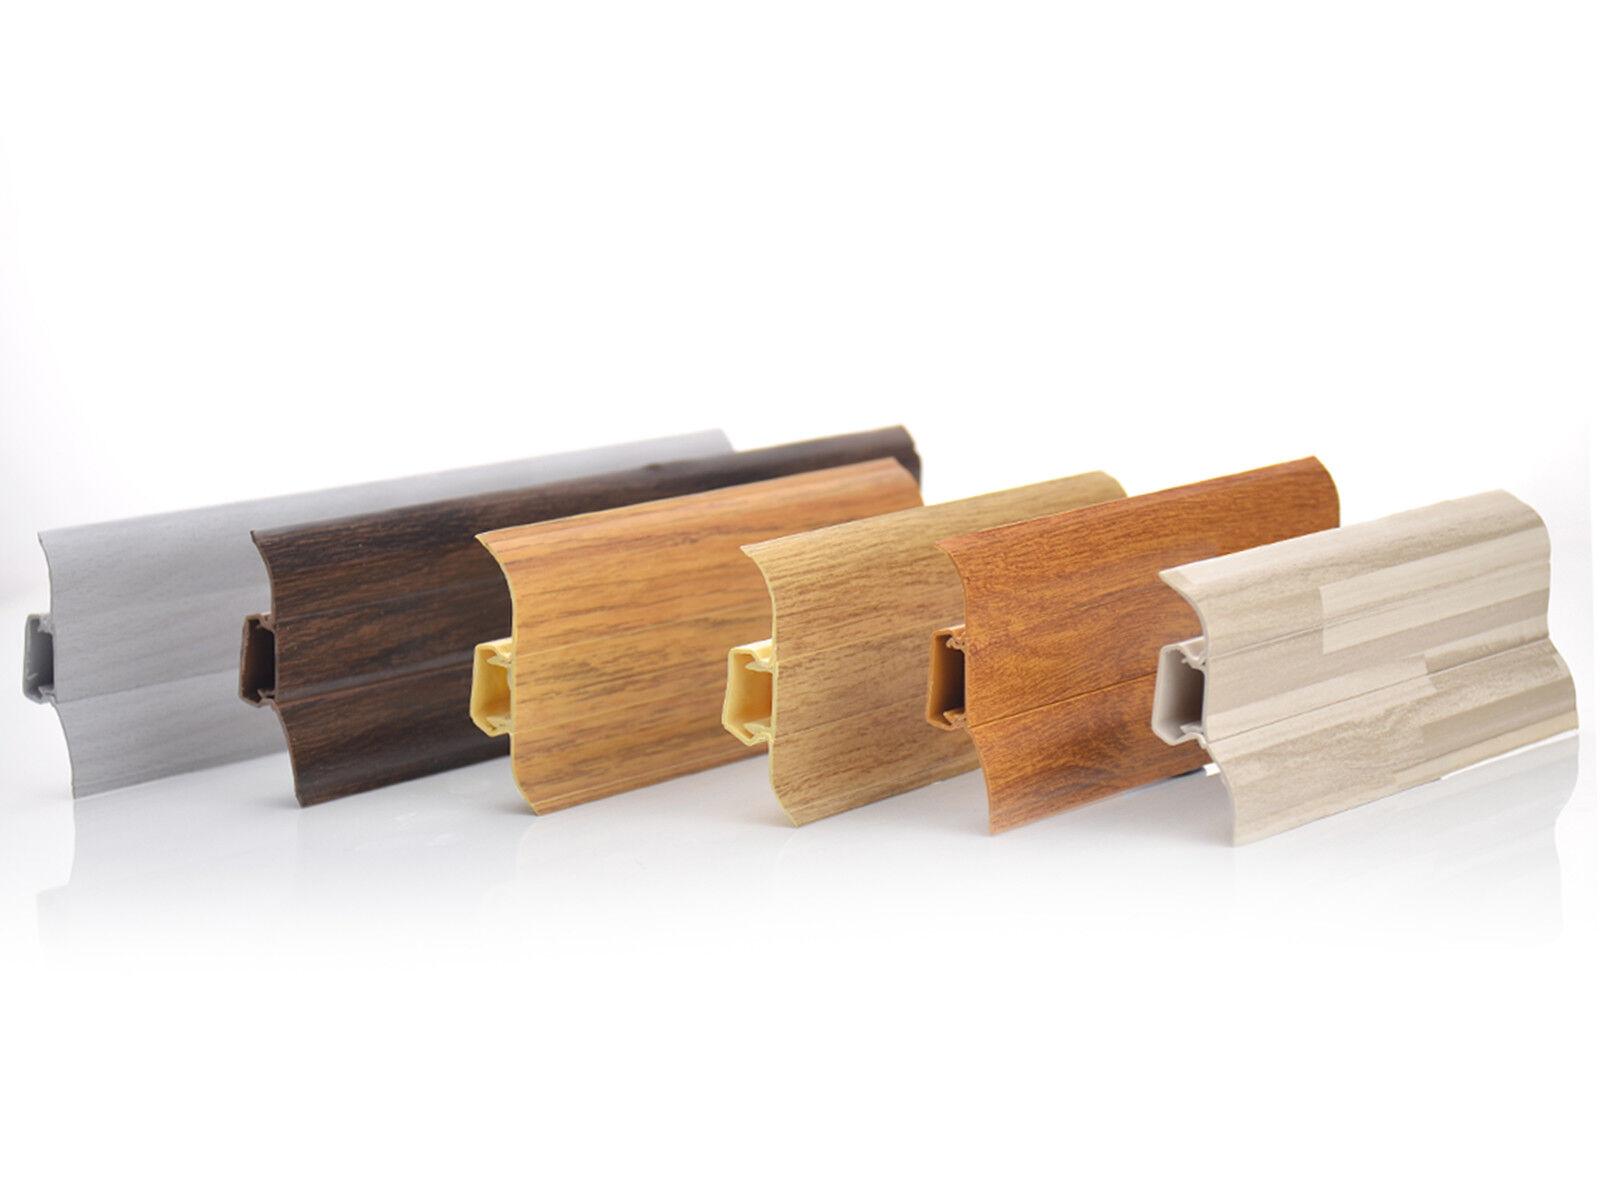 Sockelleiste weiß Echtholz   Modern Fußleiste 80mm  